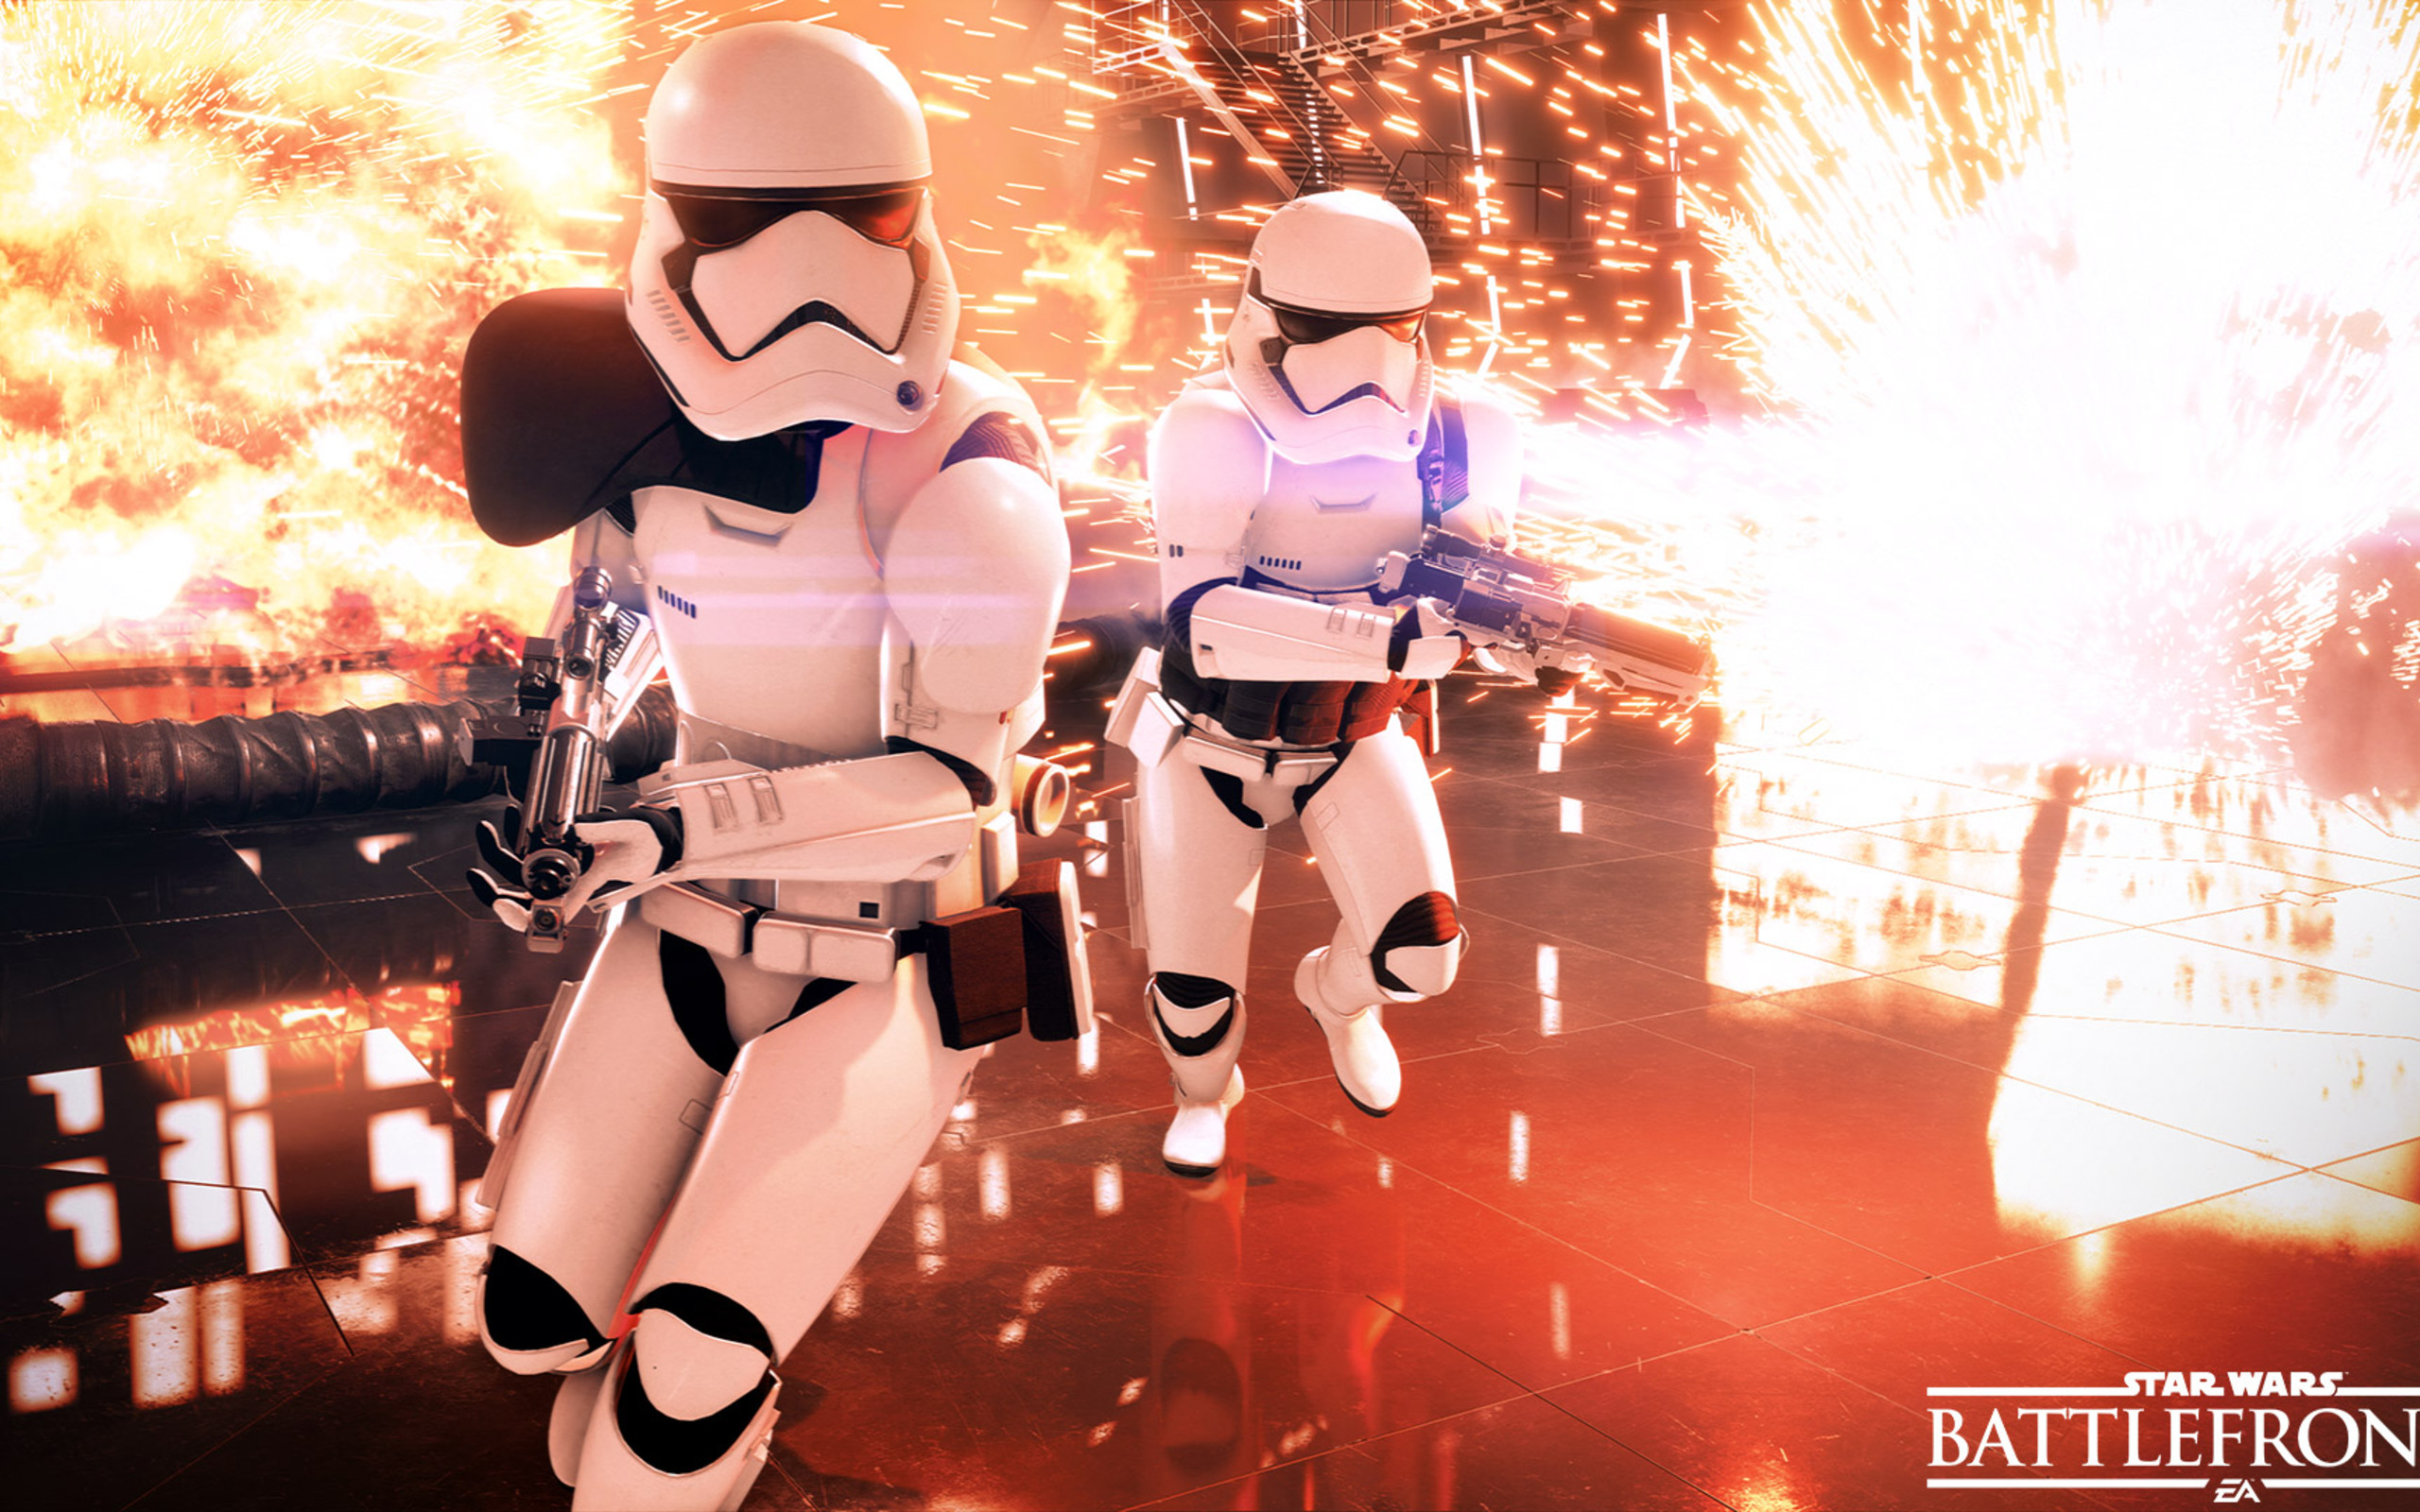 2560x1600 Star Wars Battlefront Ii 2017 1 2560x1600 Resolution Hd